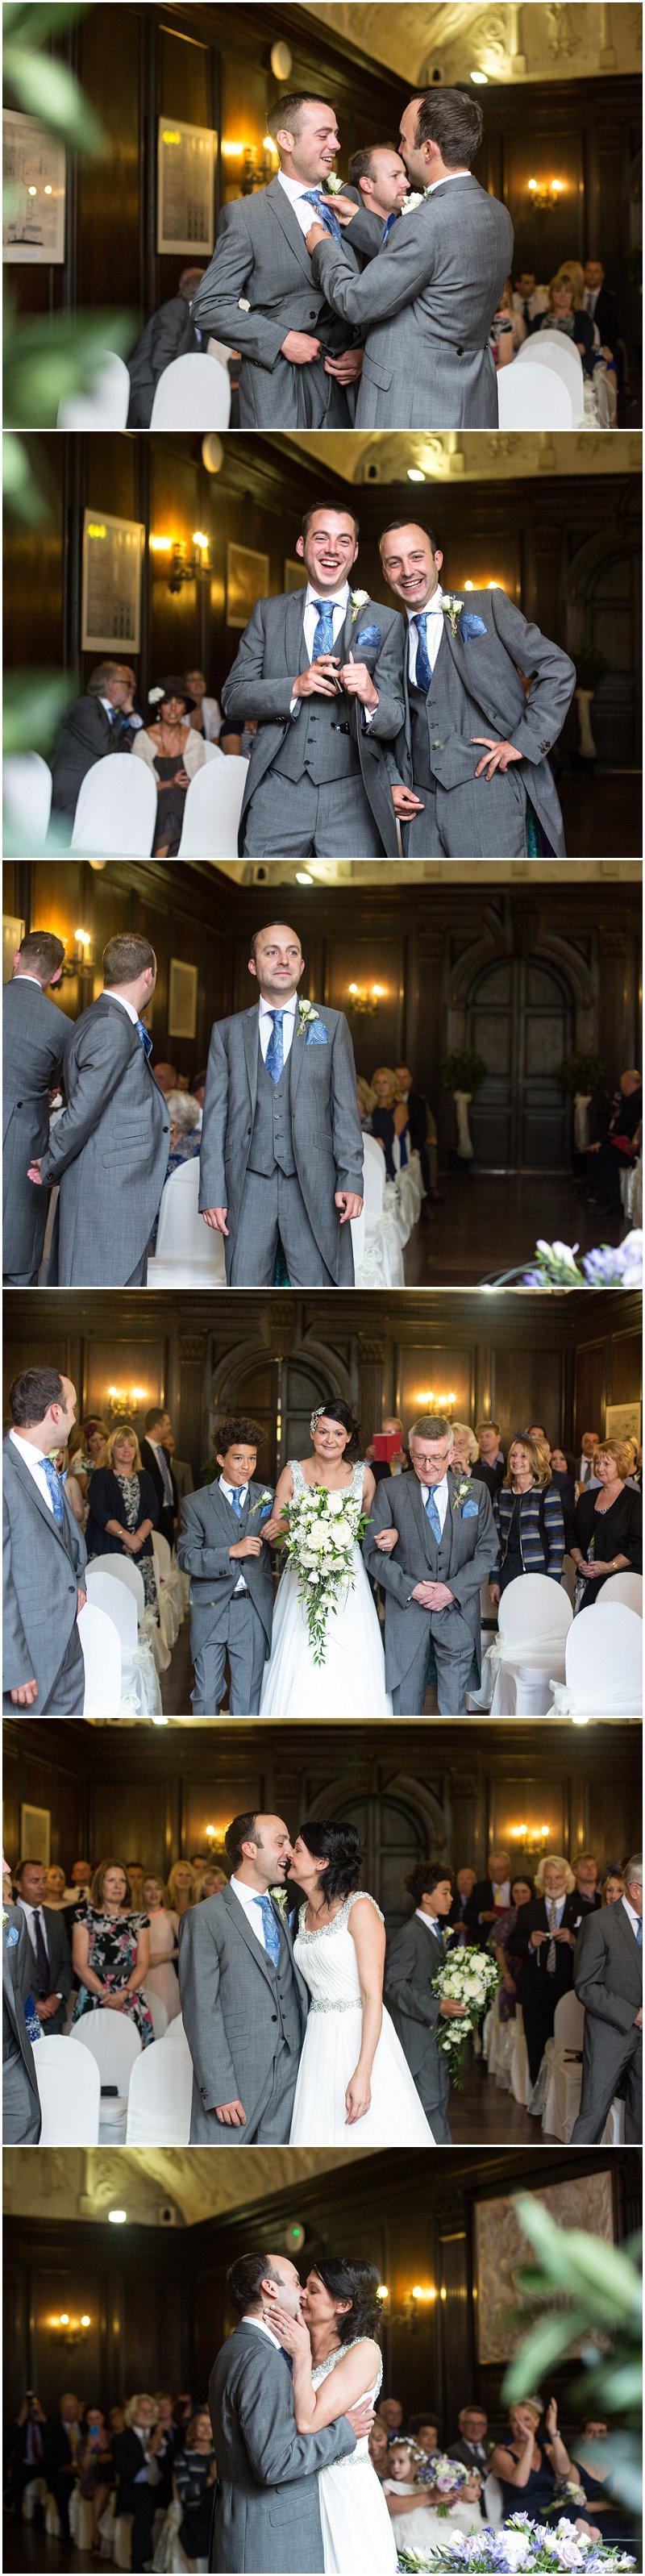 Hercules Hall Wedding at Portmeirion